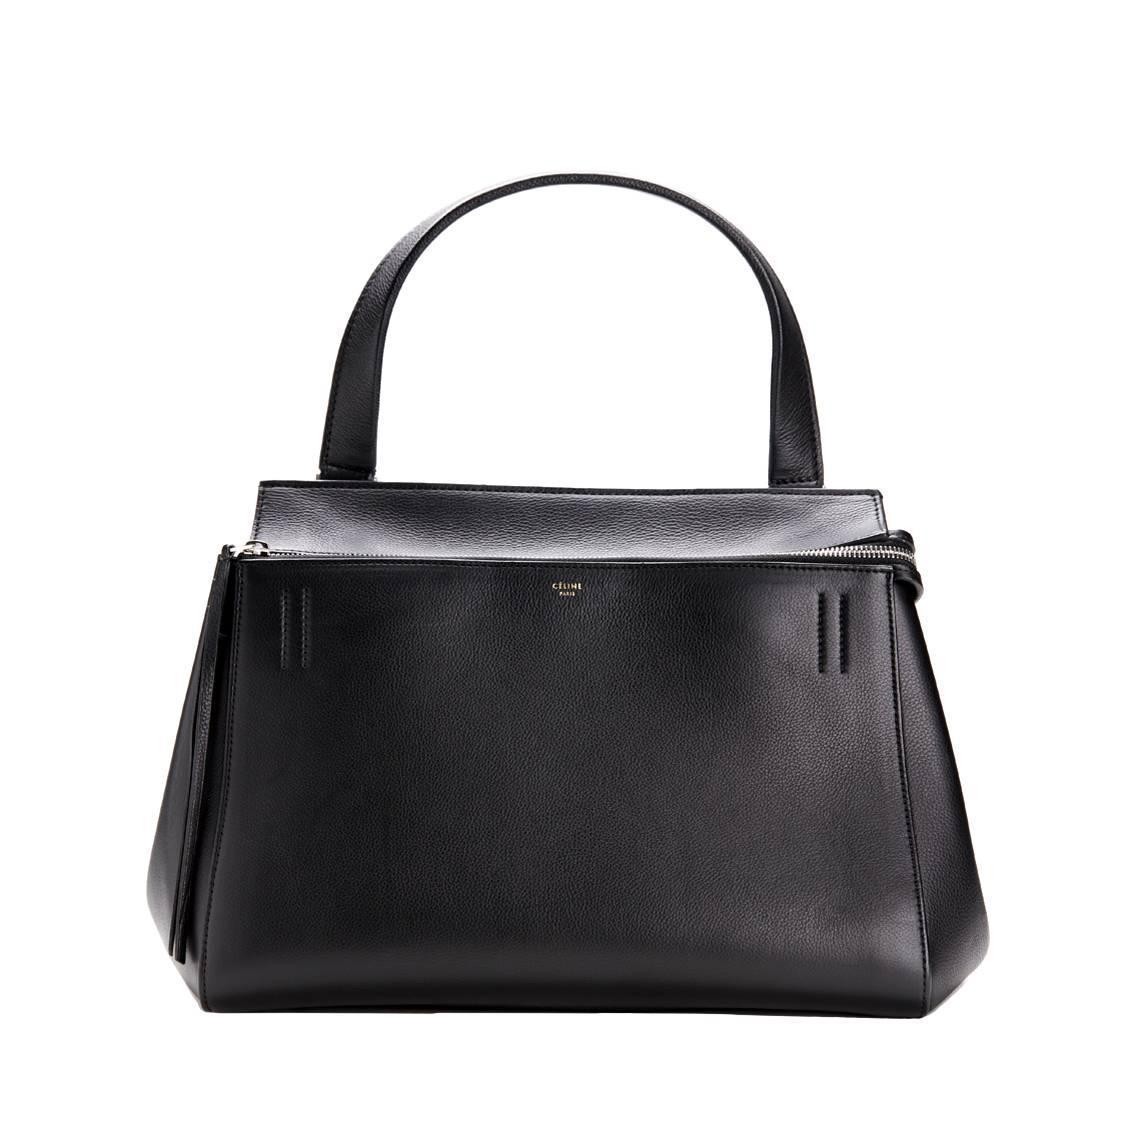 Vintage C¨¦line Tote Bags - 44 For Sale at 1stdibs